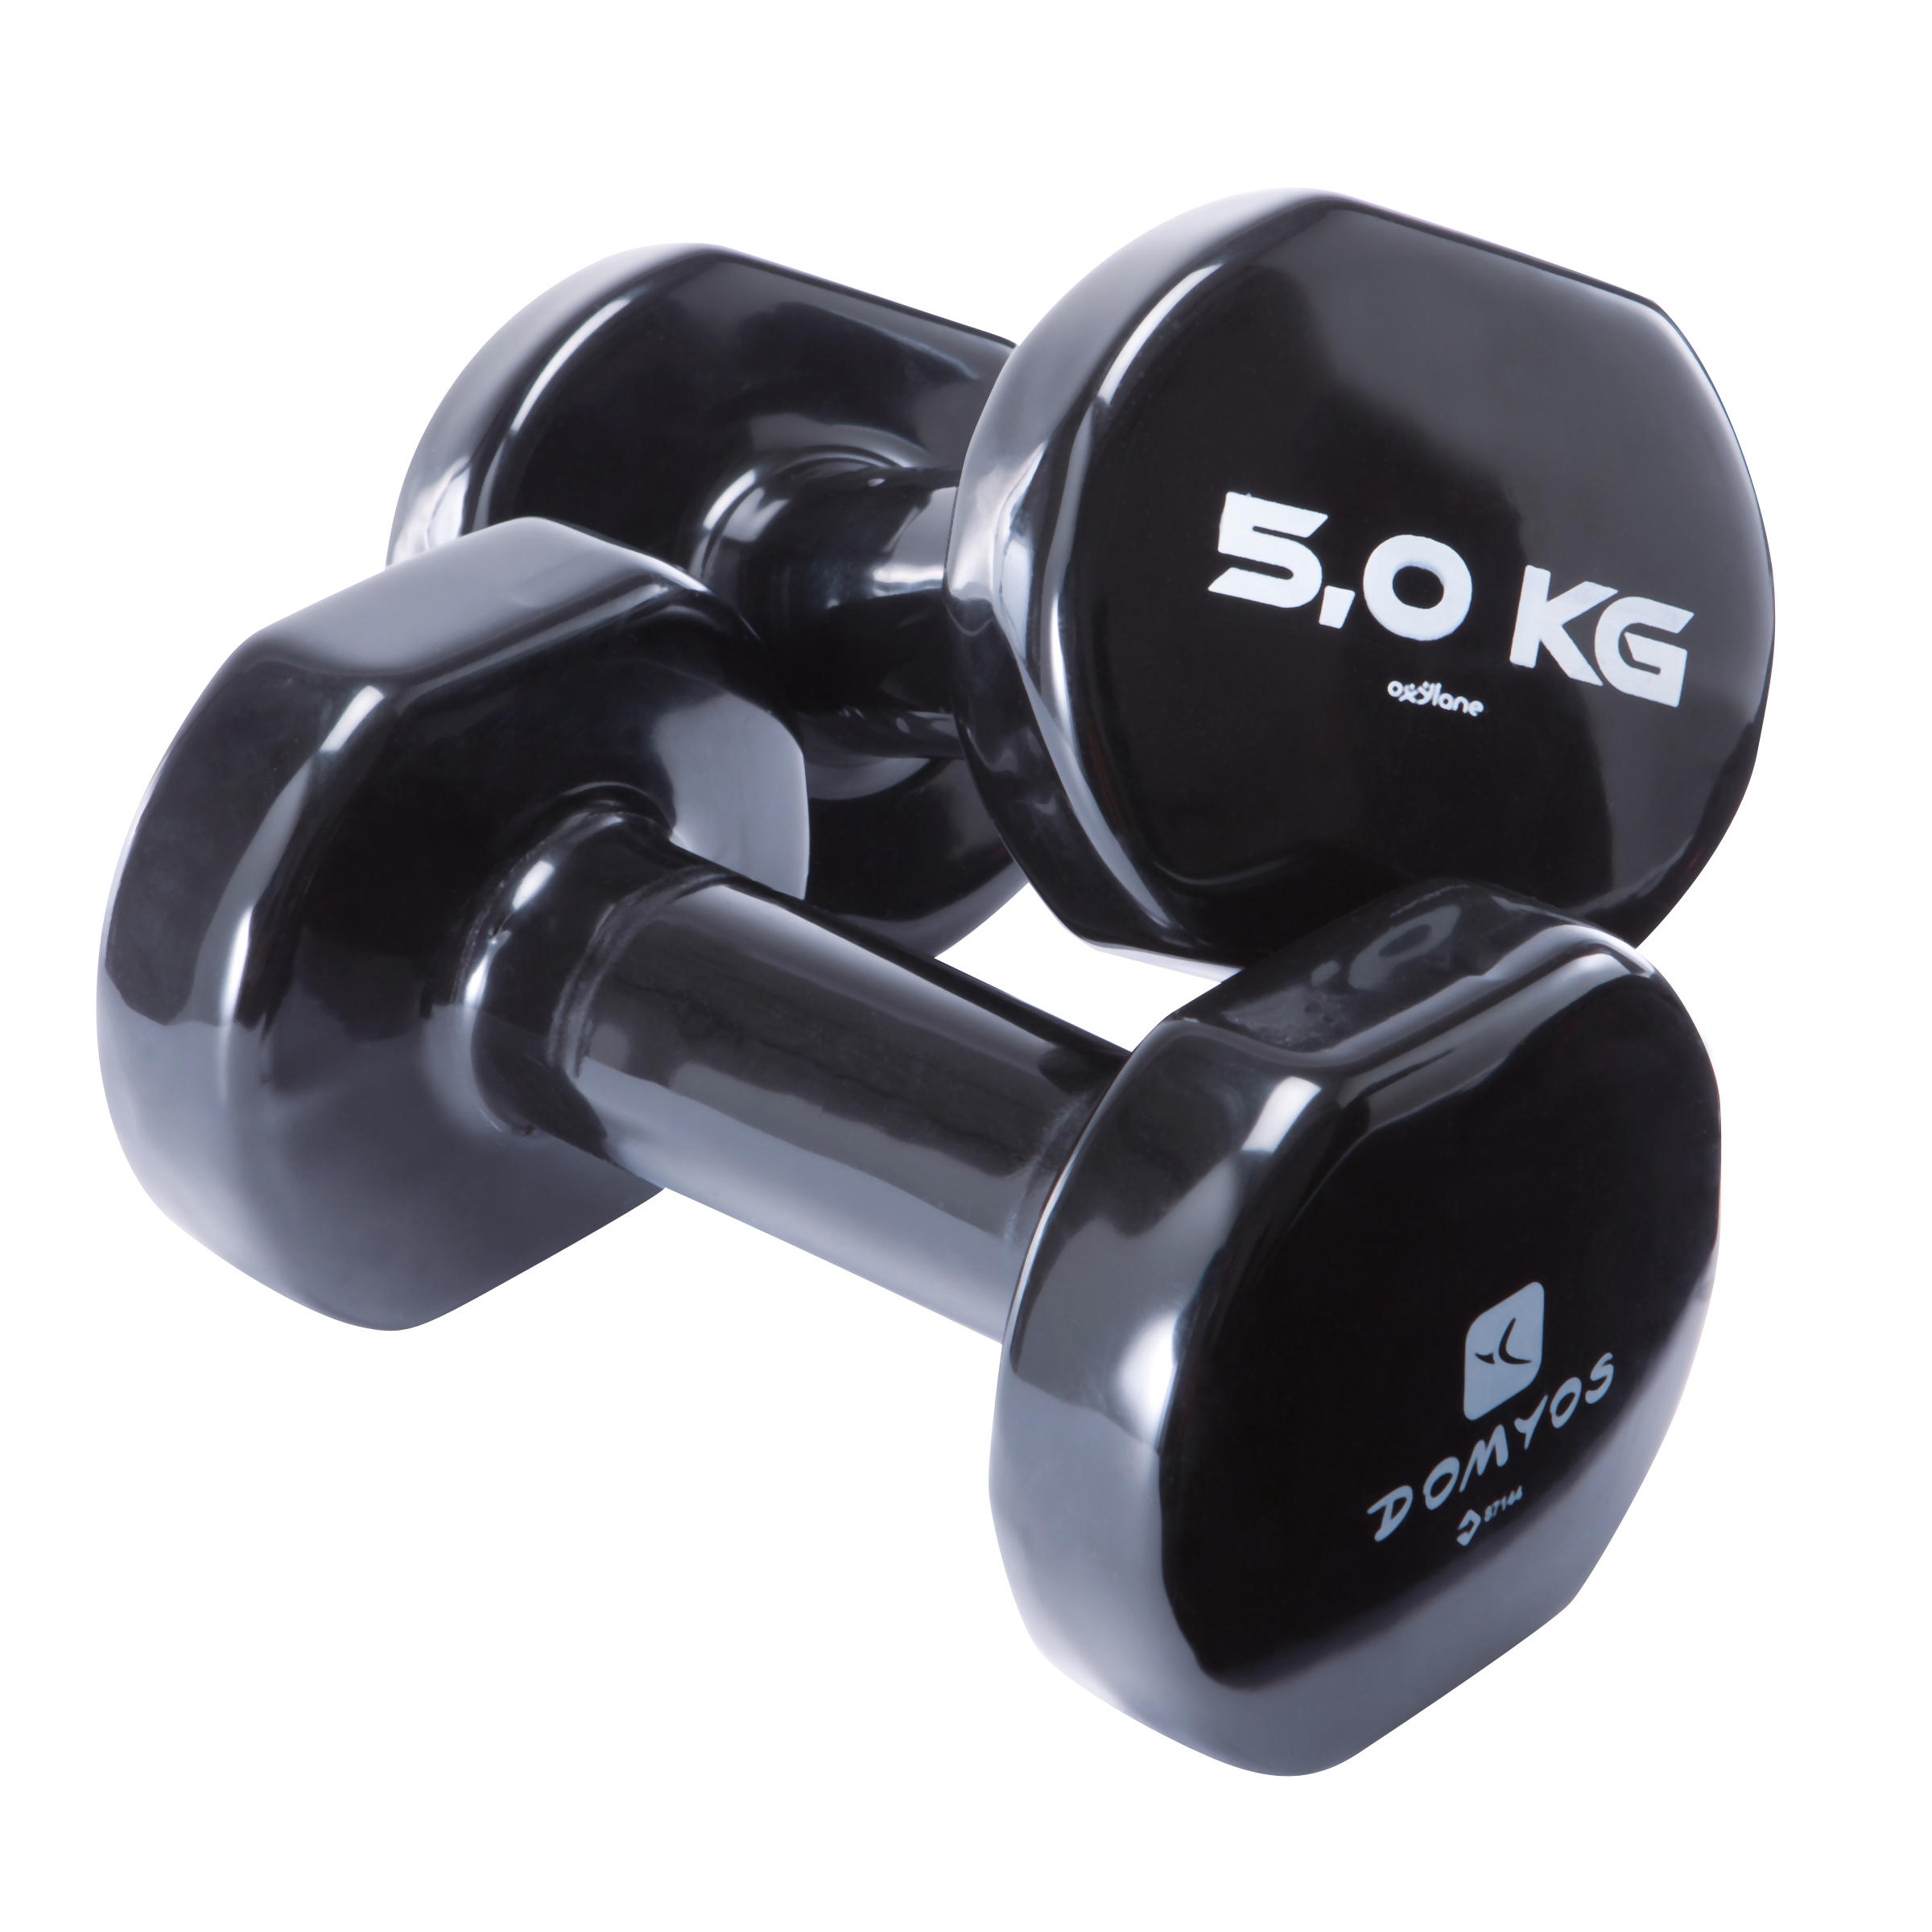 PVC Gym and Pilates Dumbbells - 2 x 5 kg